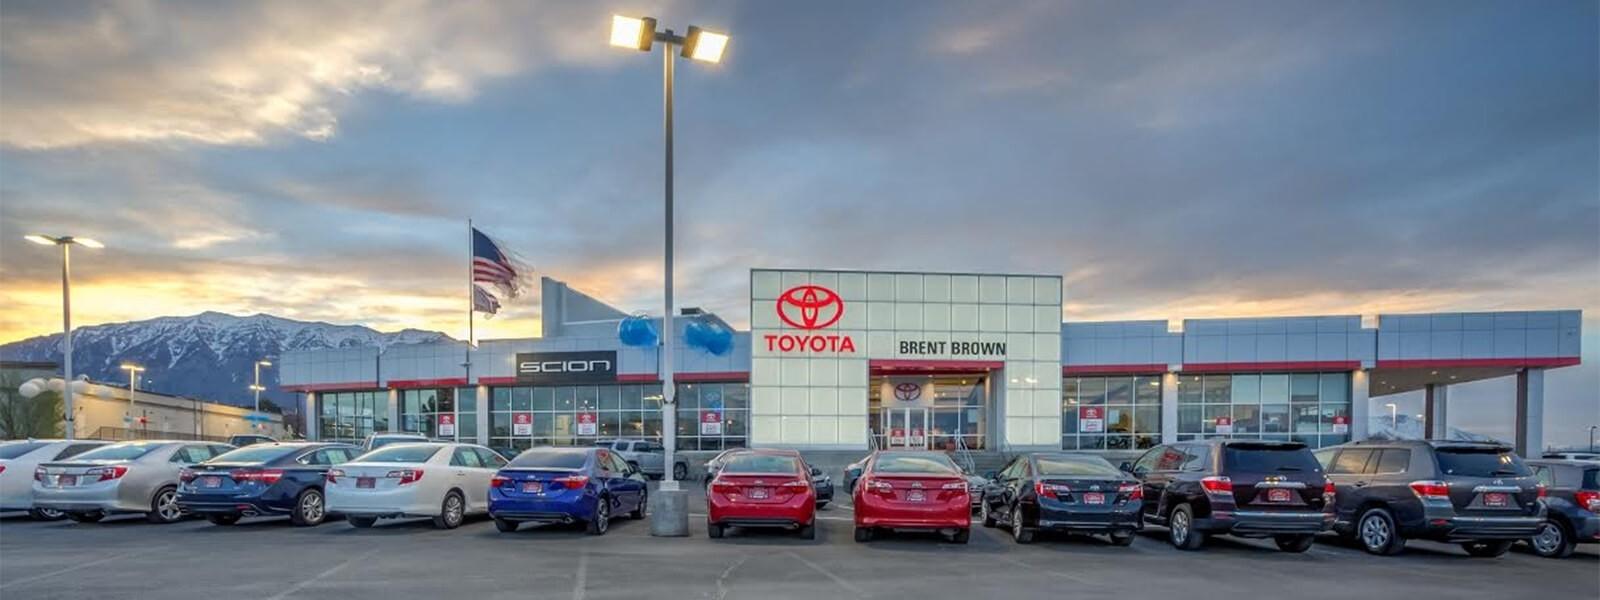 Brent Brown Toyota Dealership